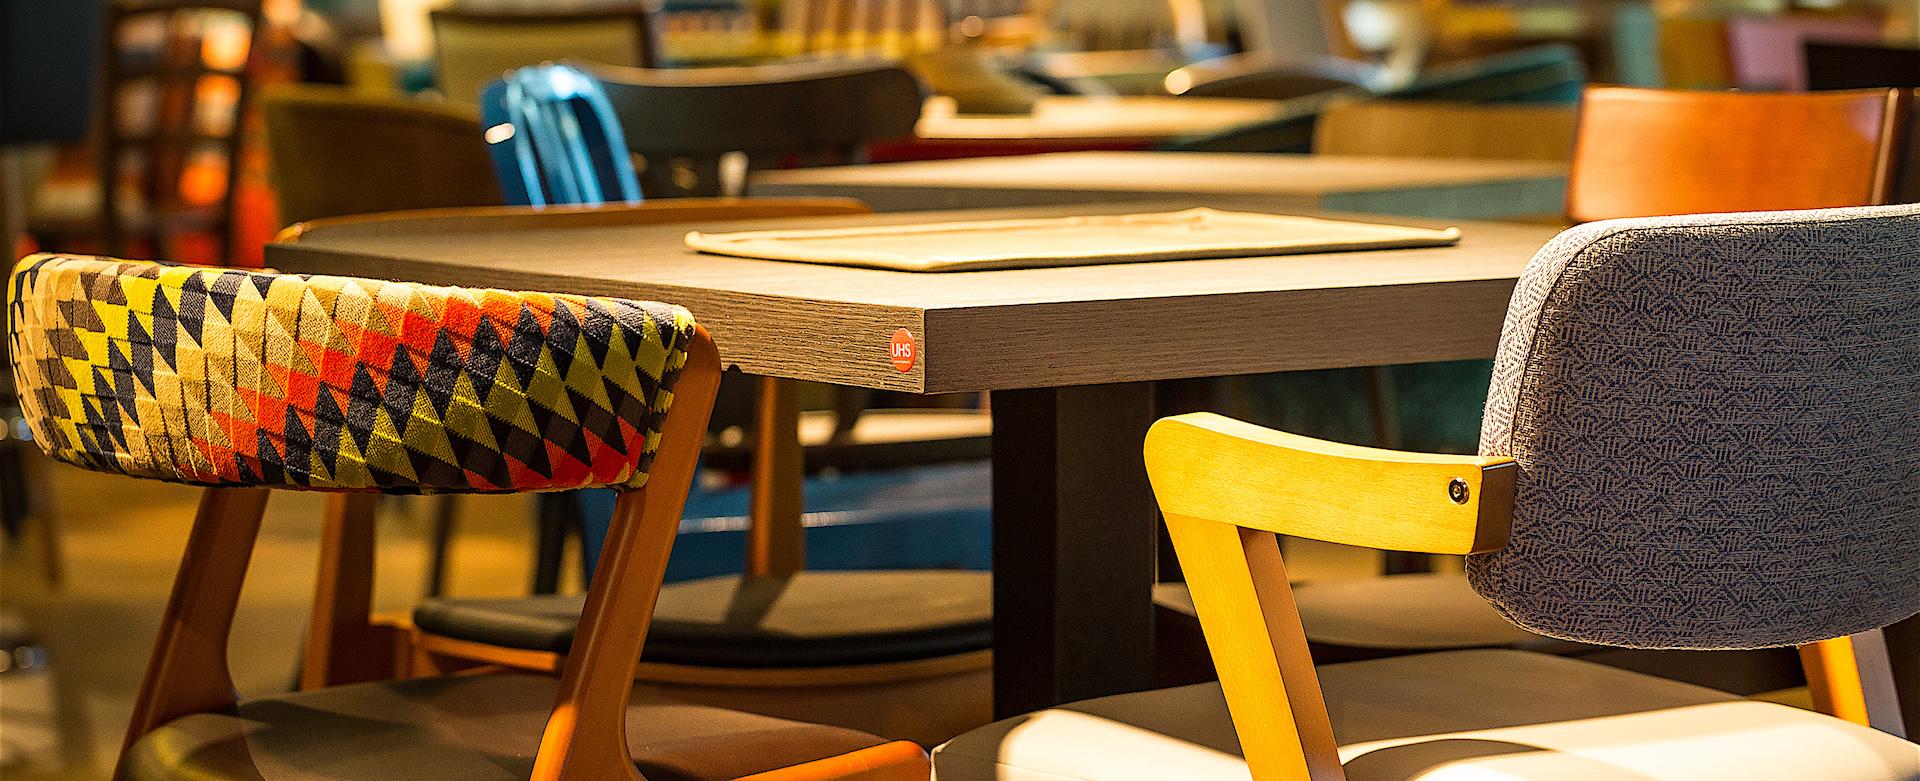 UHS Furniture